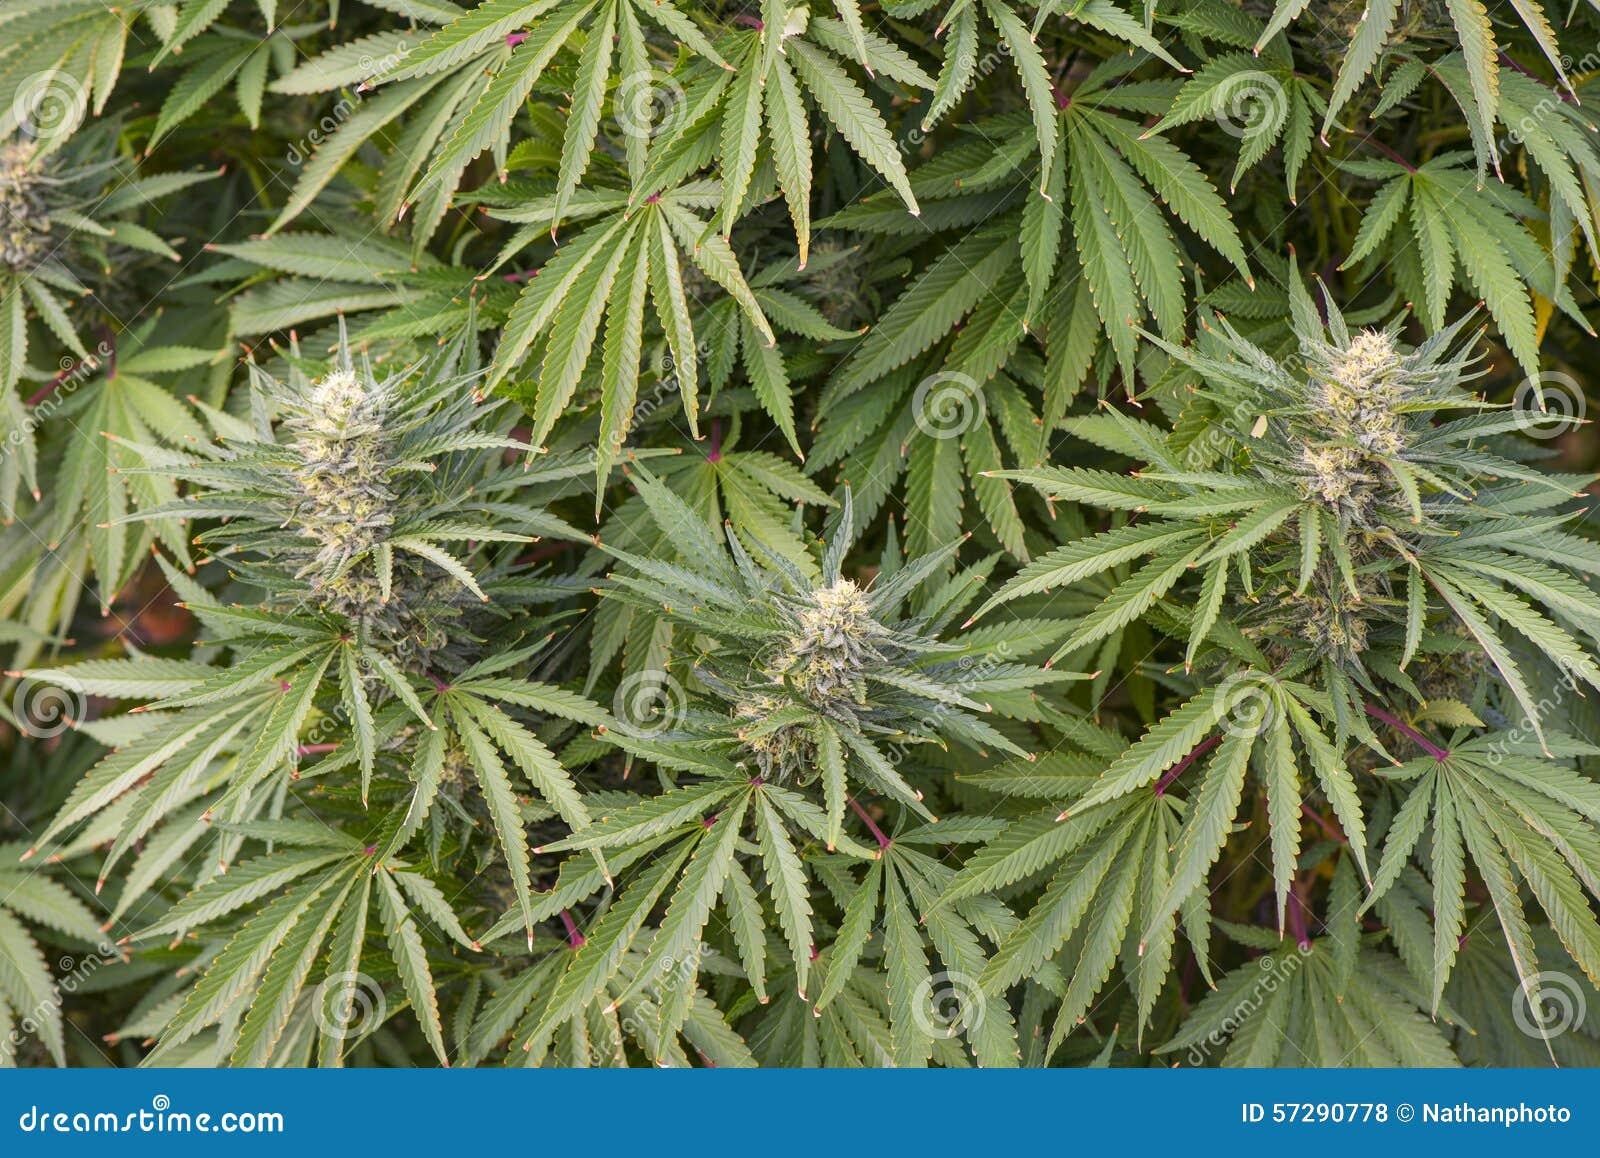 Фото урожай марихуаны коробка для хранения марихуаны